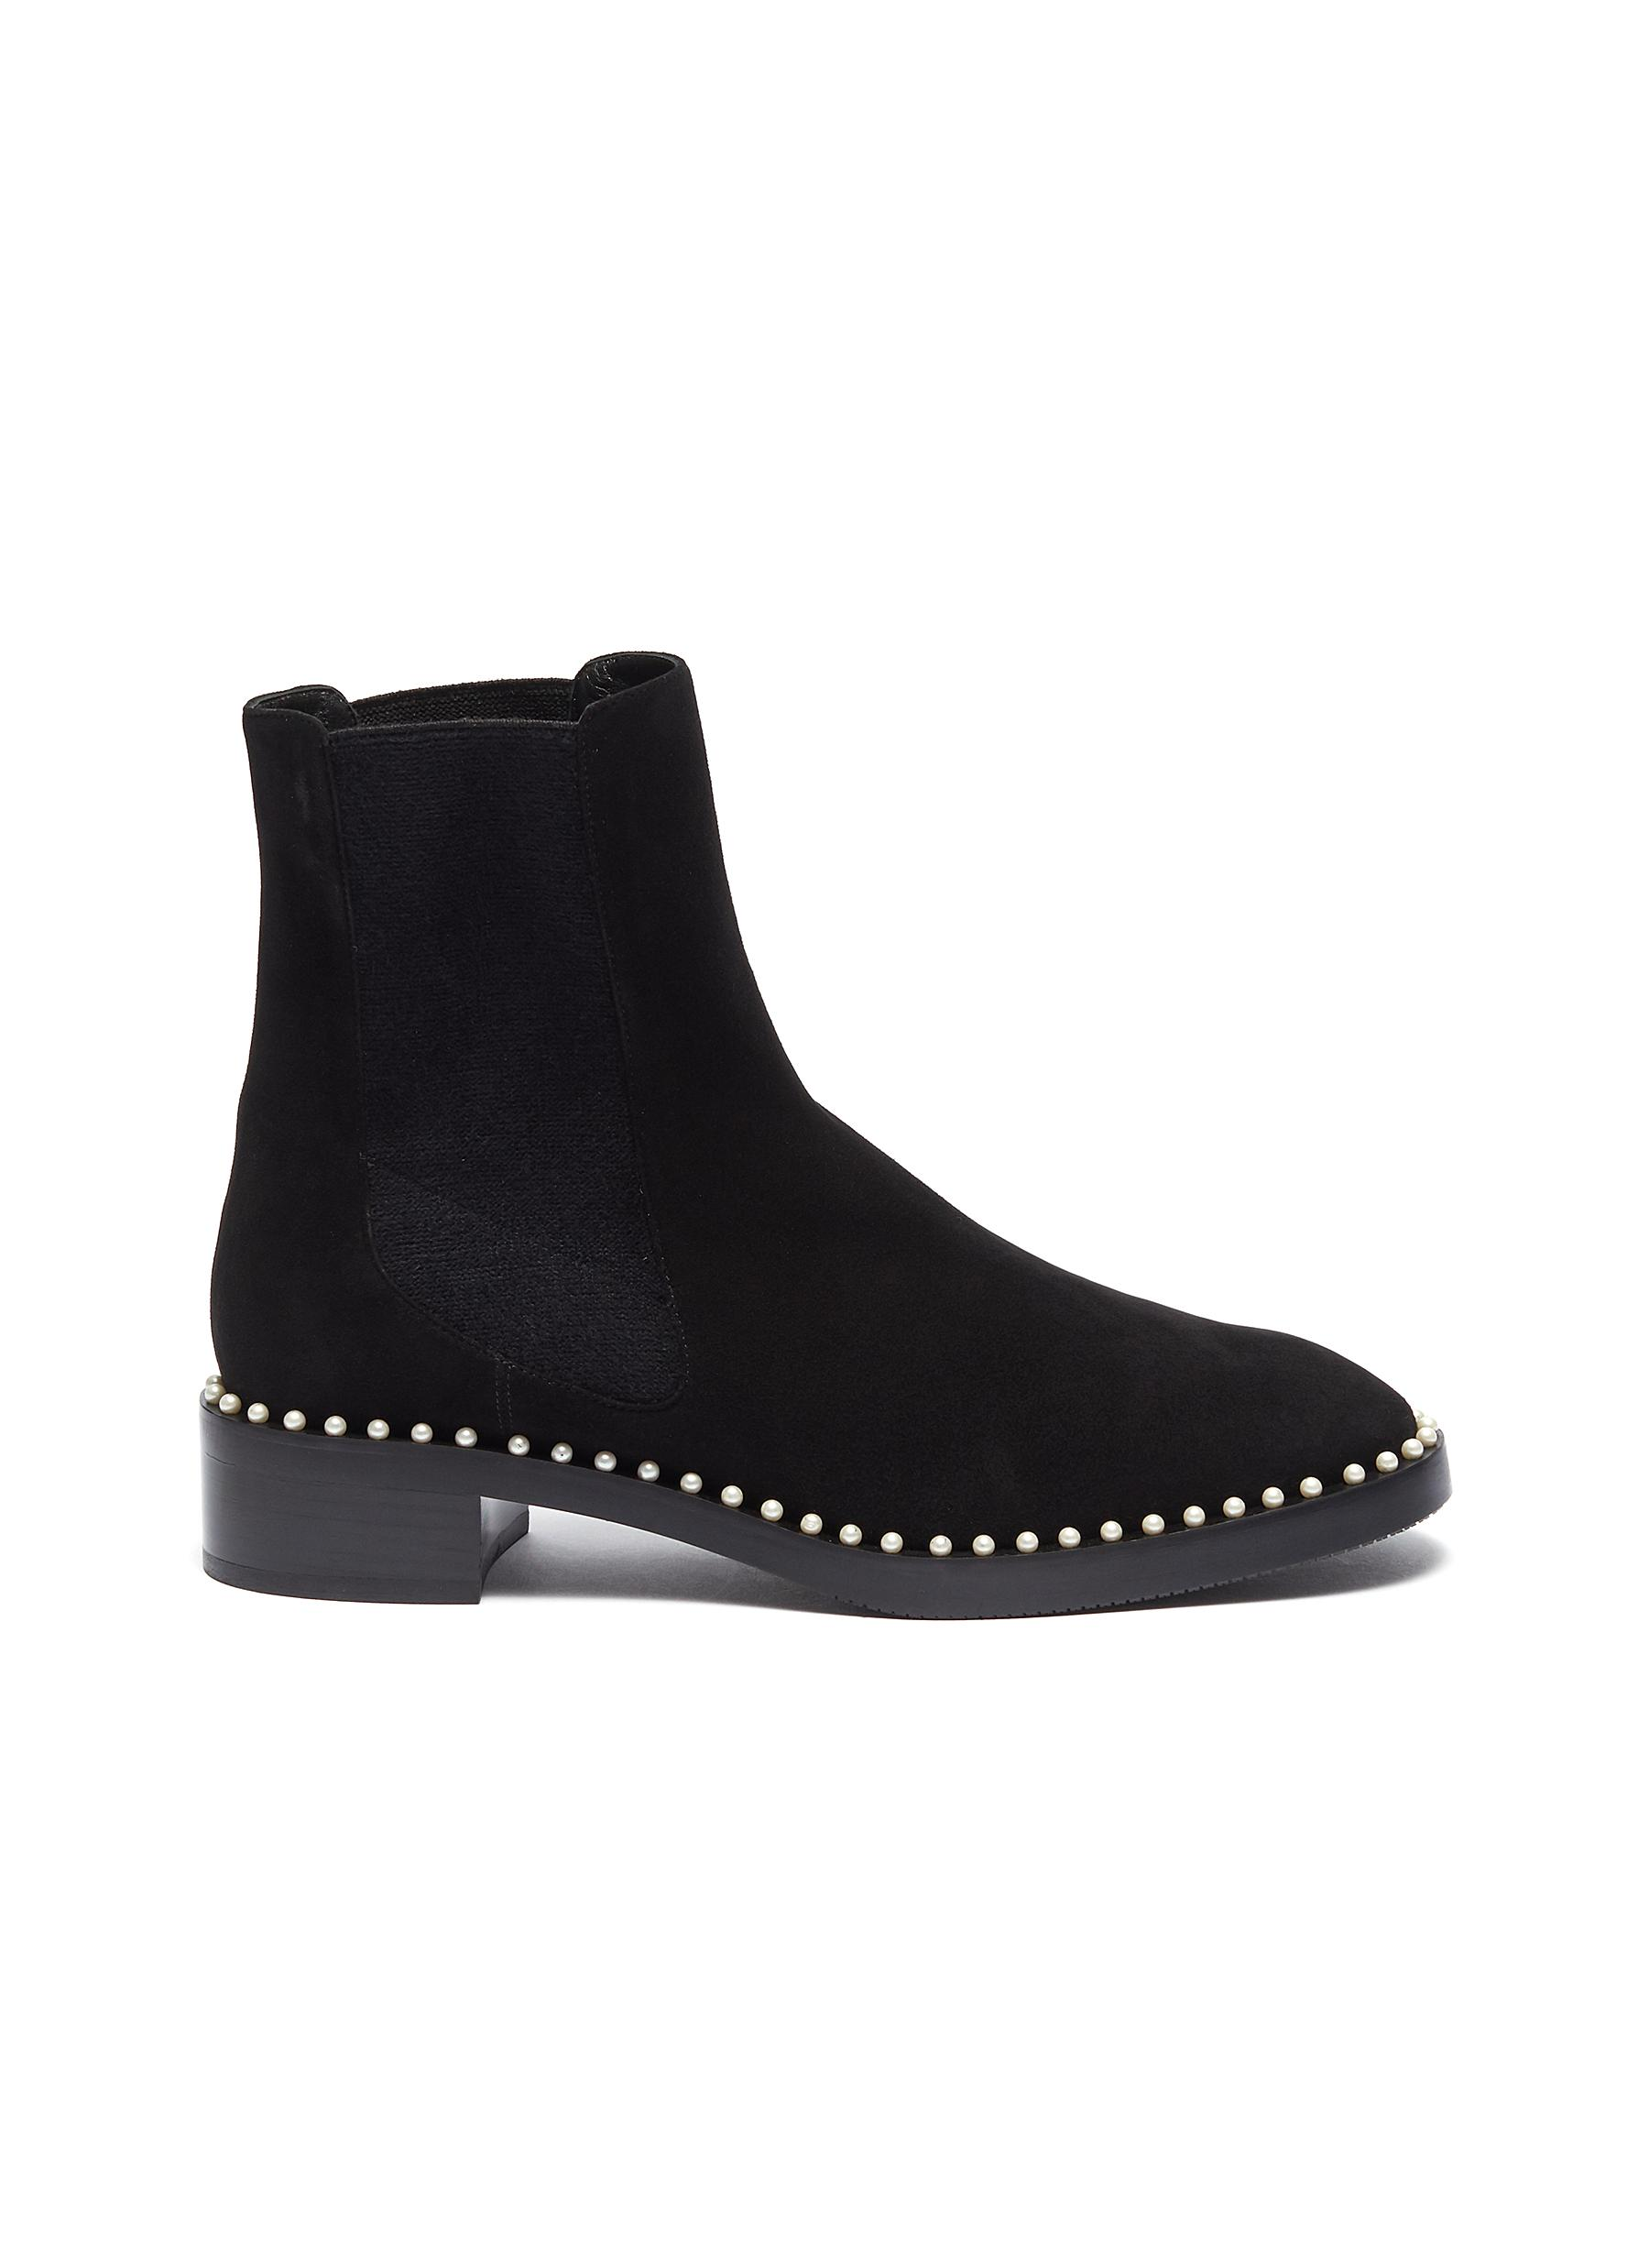 Cline faux pearl welt suede Chelsea boots by Stuart Weitzman